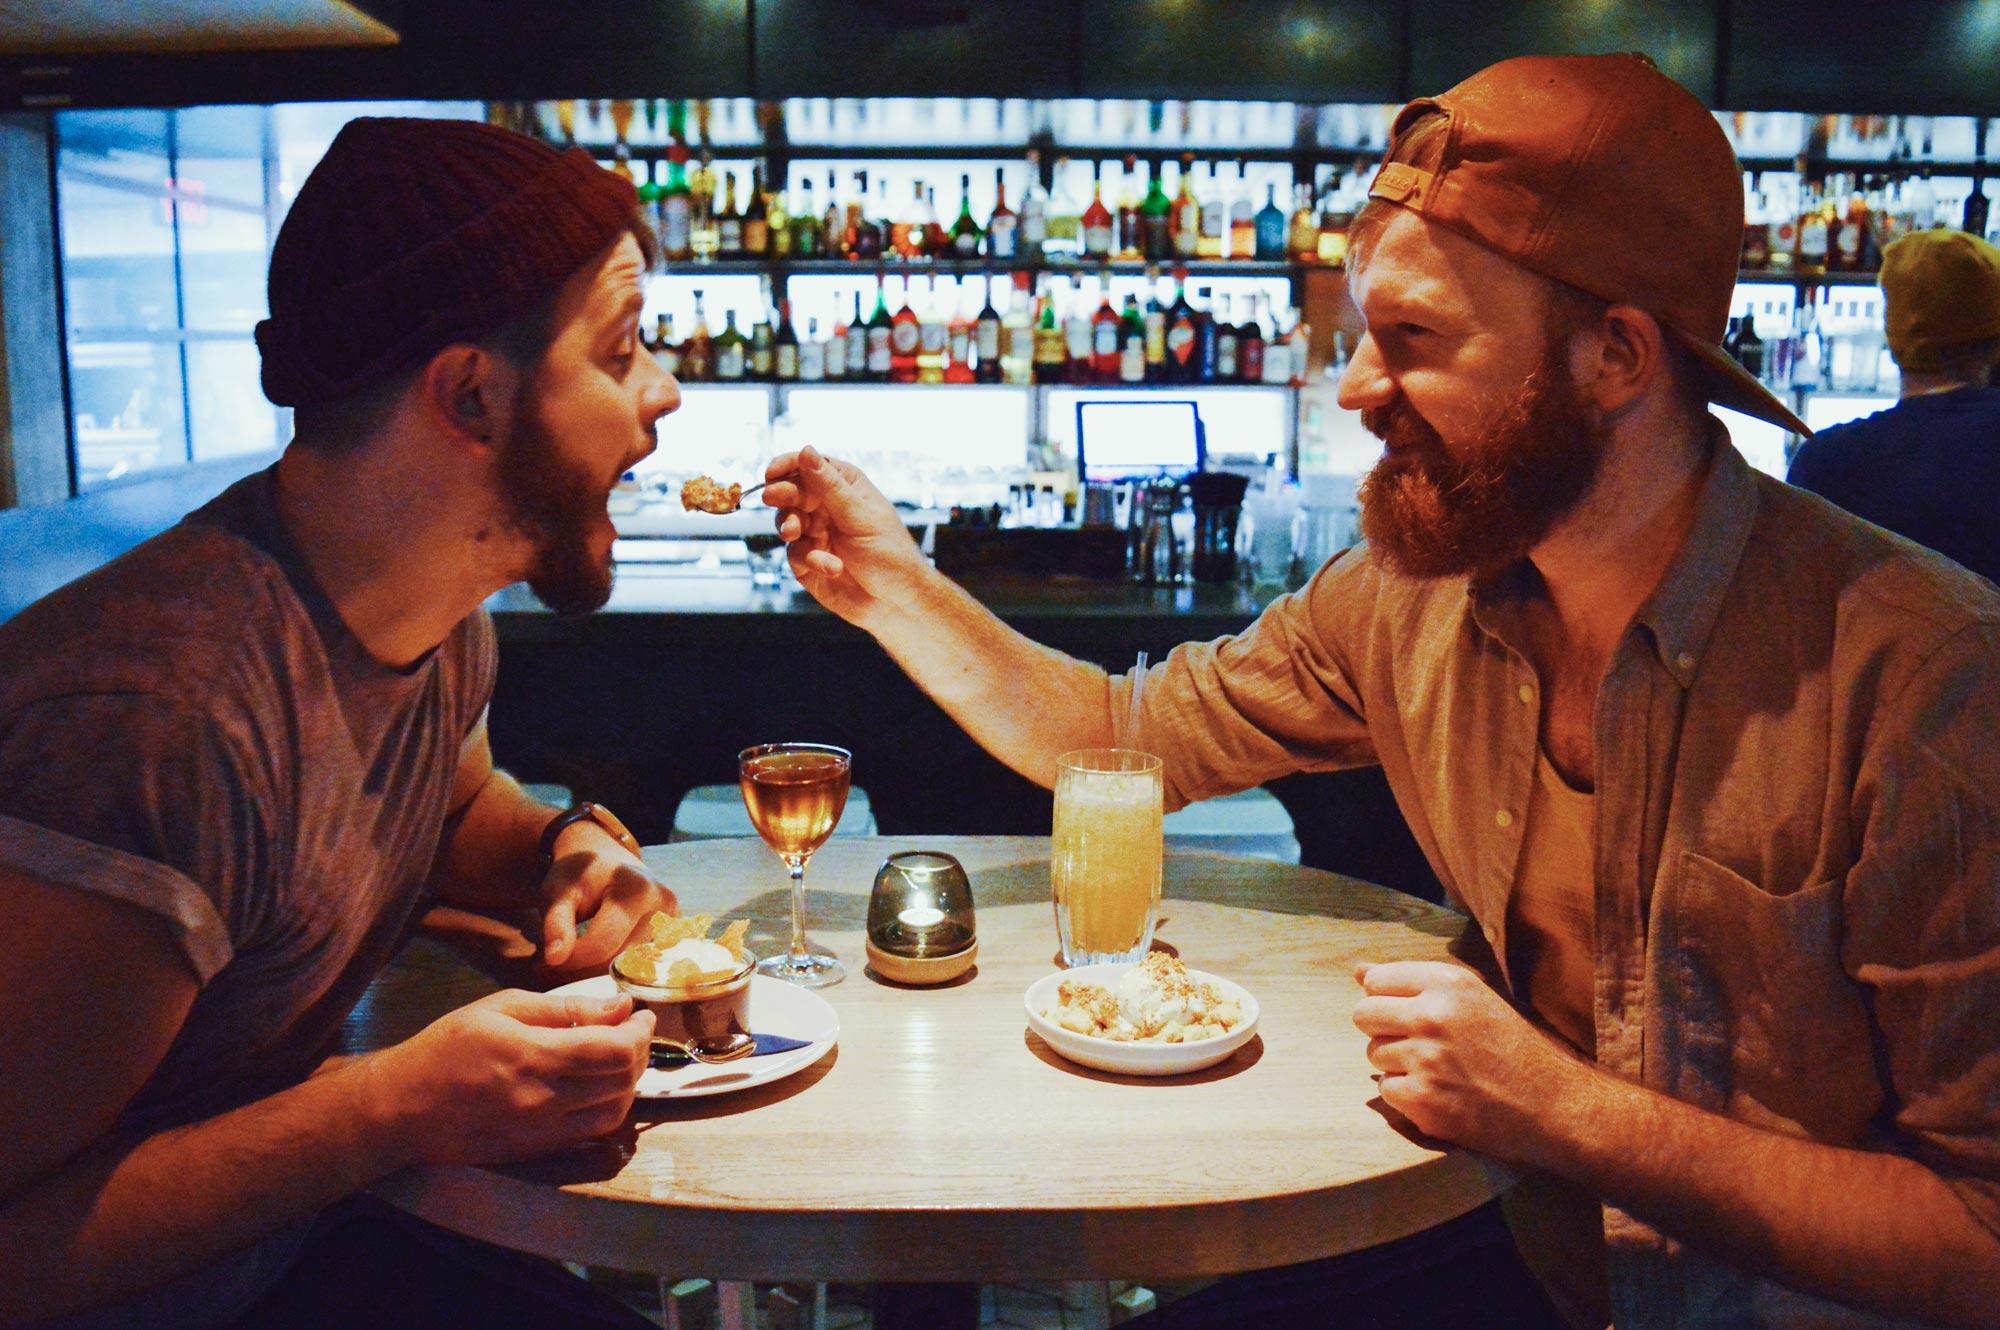 10 Best Gay-friendly Restaurants in Vancouver Schwulenfreundliche Restaurants Vancouver Top 10 awesome & gay-friendly Restaurants Vancouver, BC © CoupleofMen.com